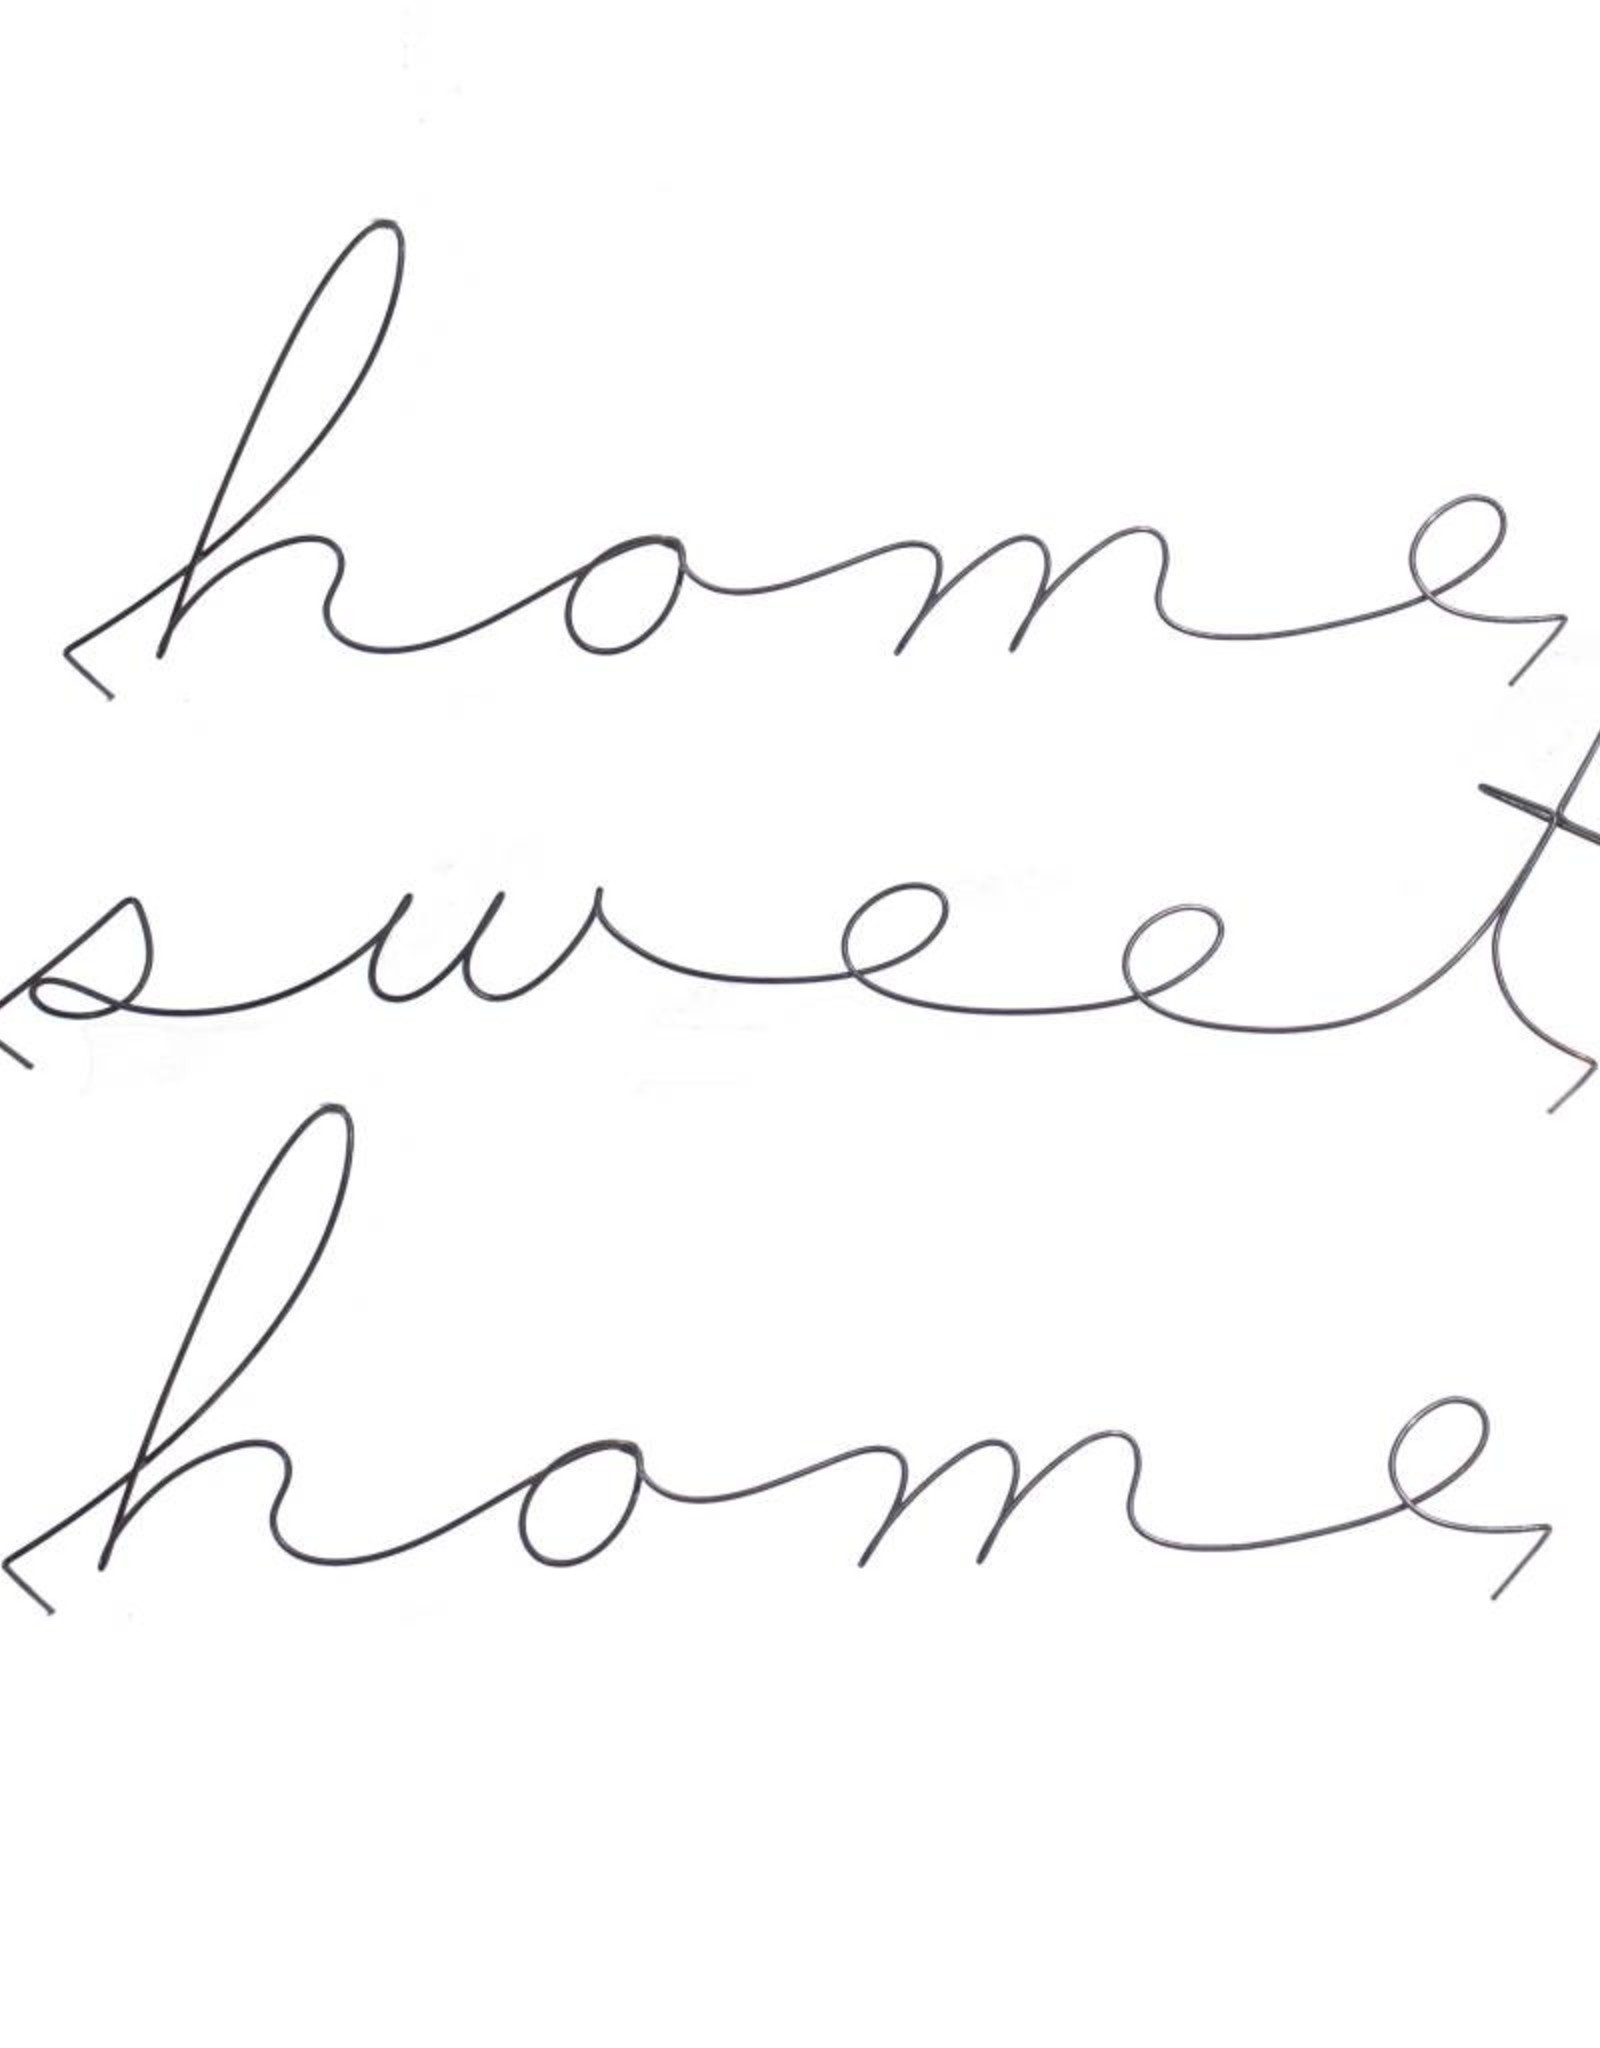 Gauge NYC 'home sweet home' Wire Word Poetic